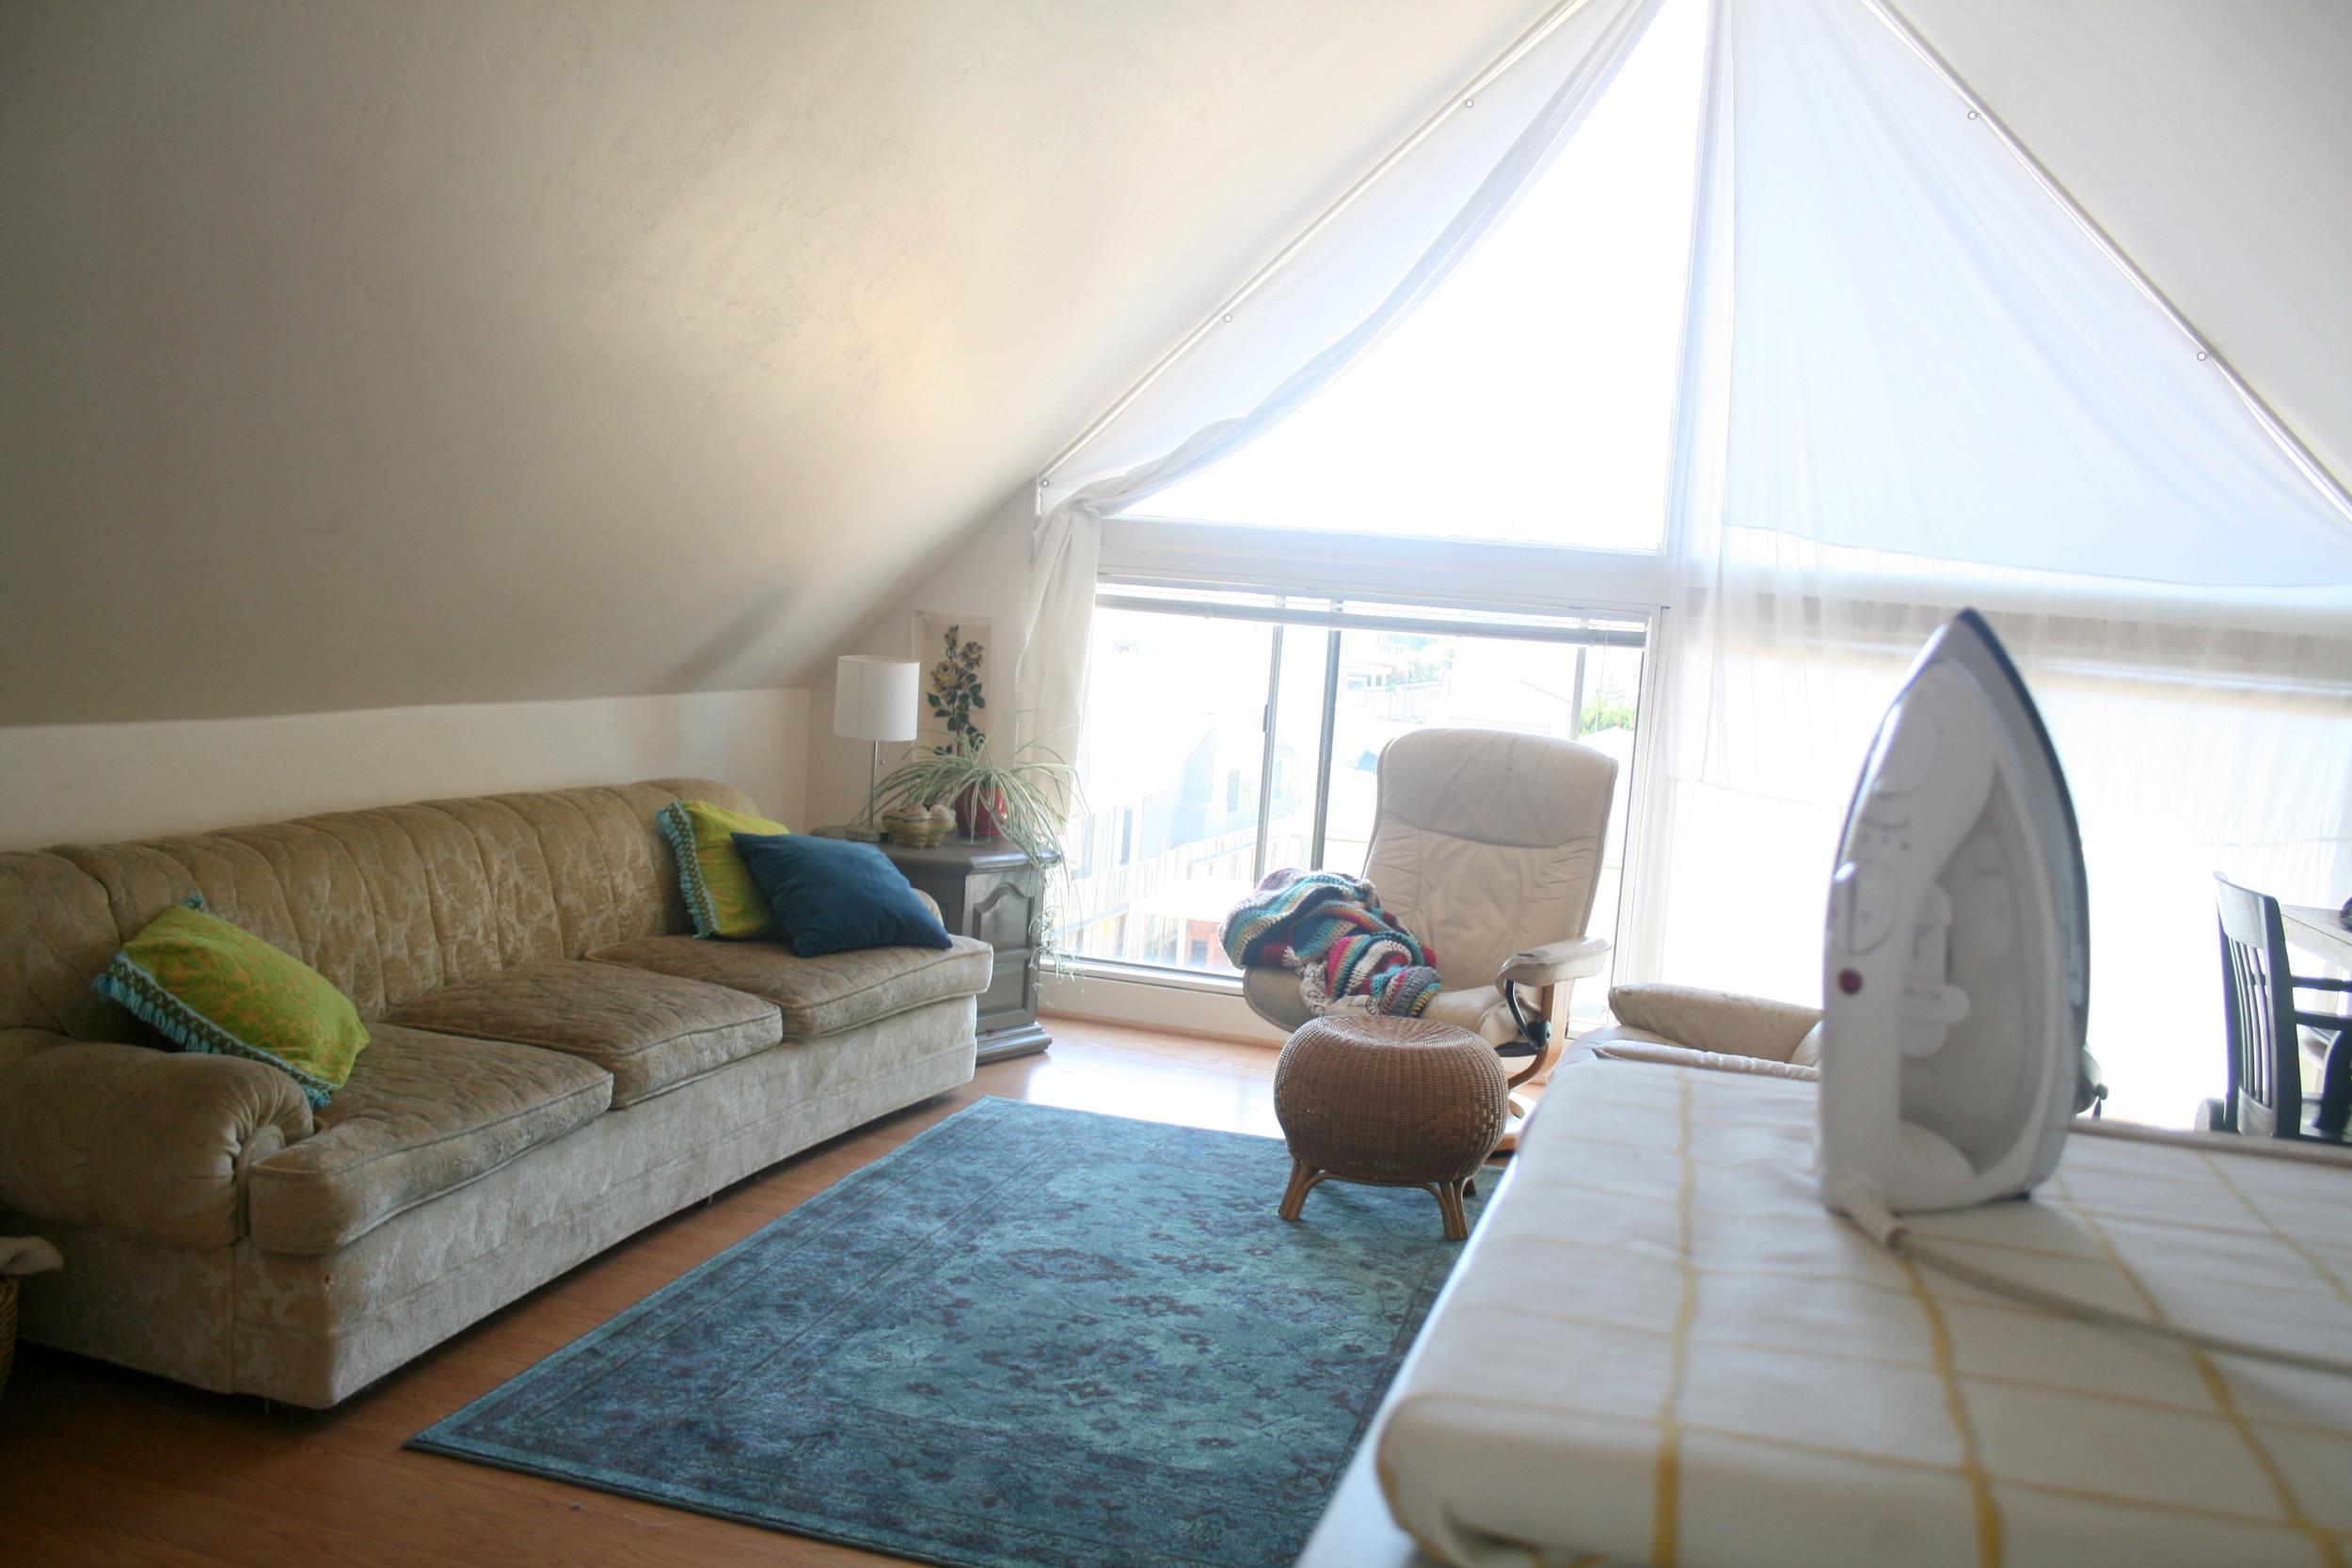 blue corduroy living room sewing studio